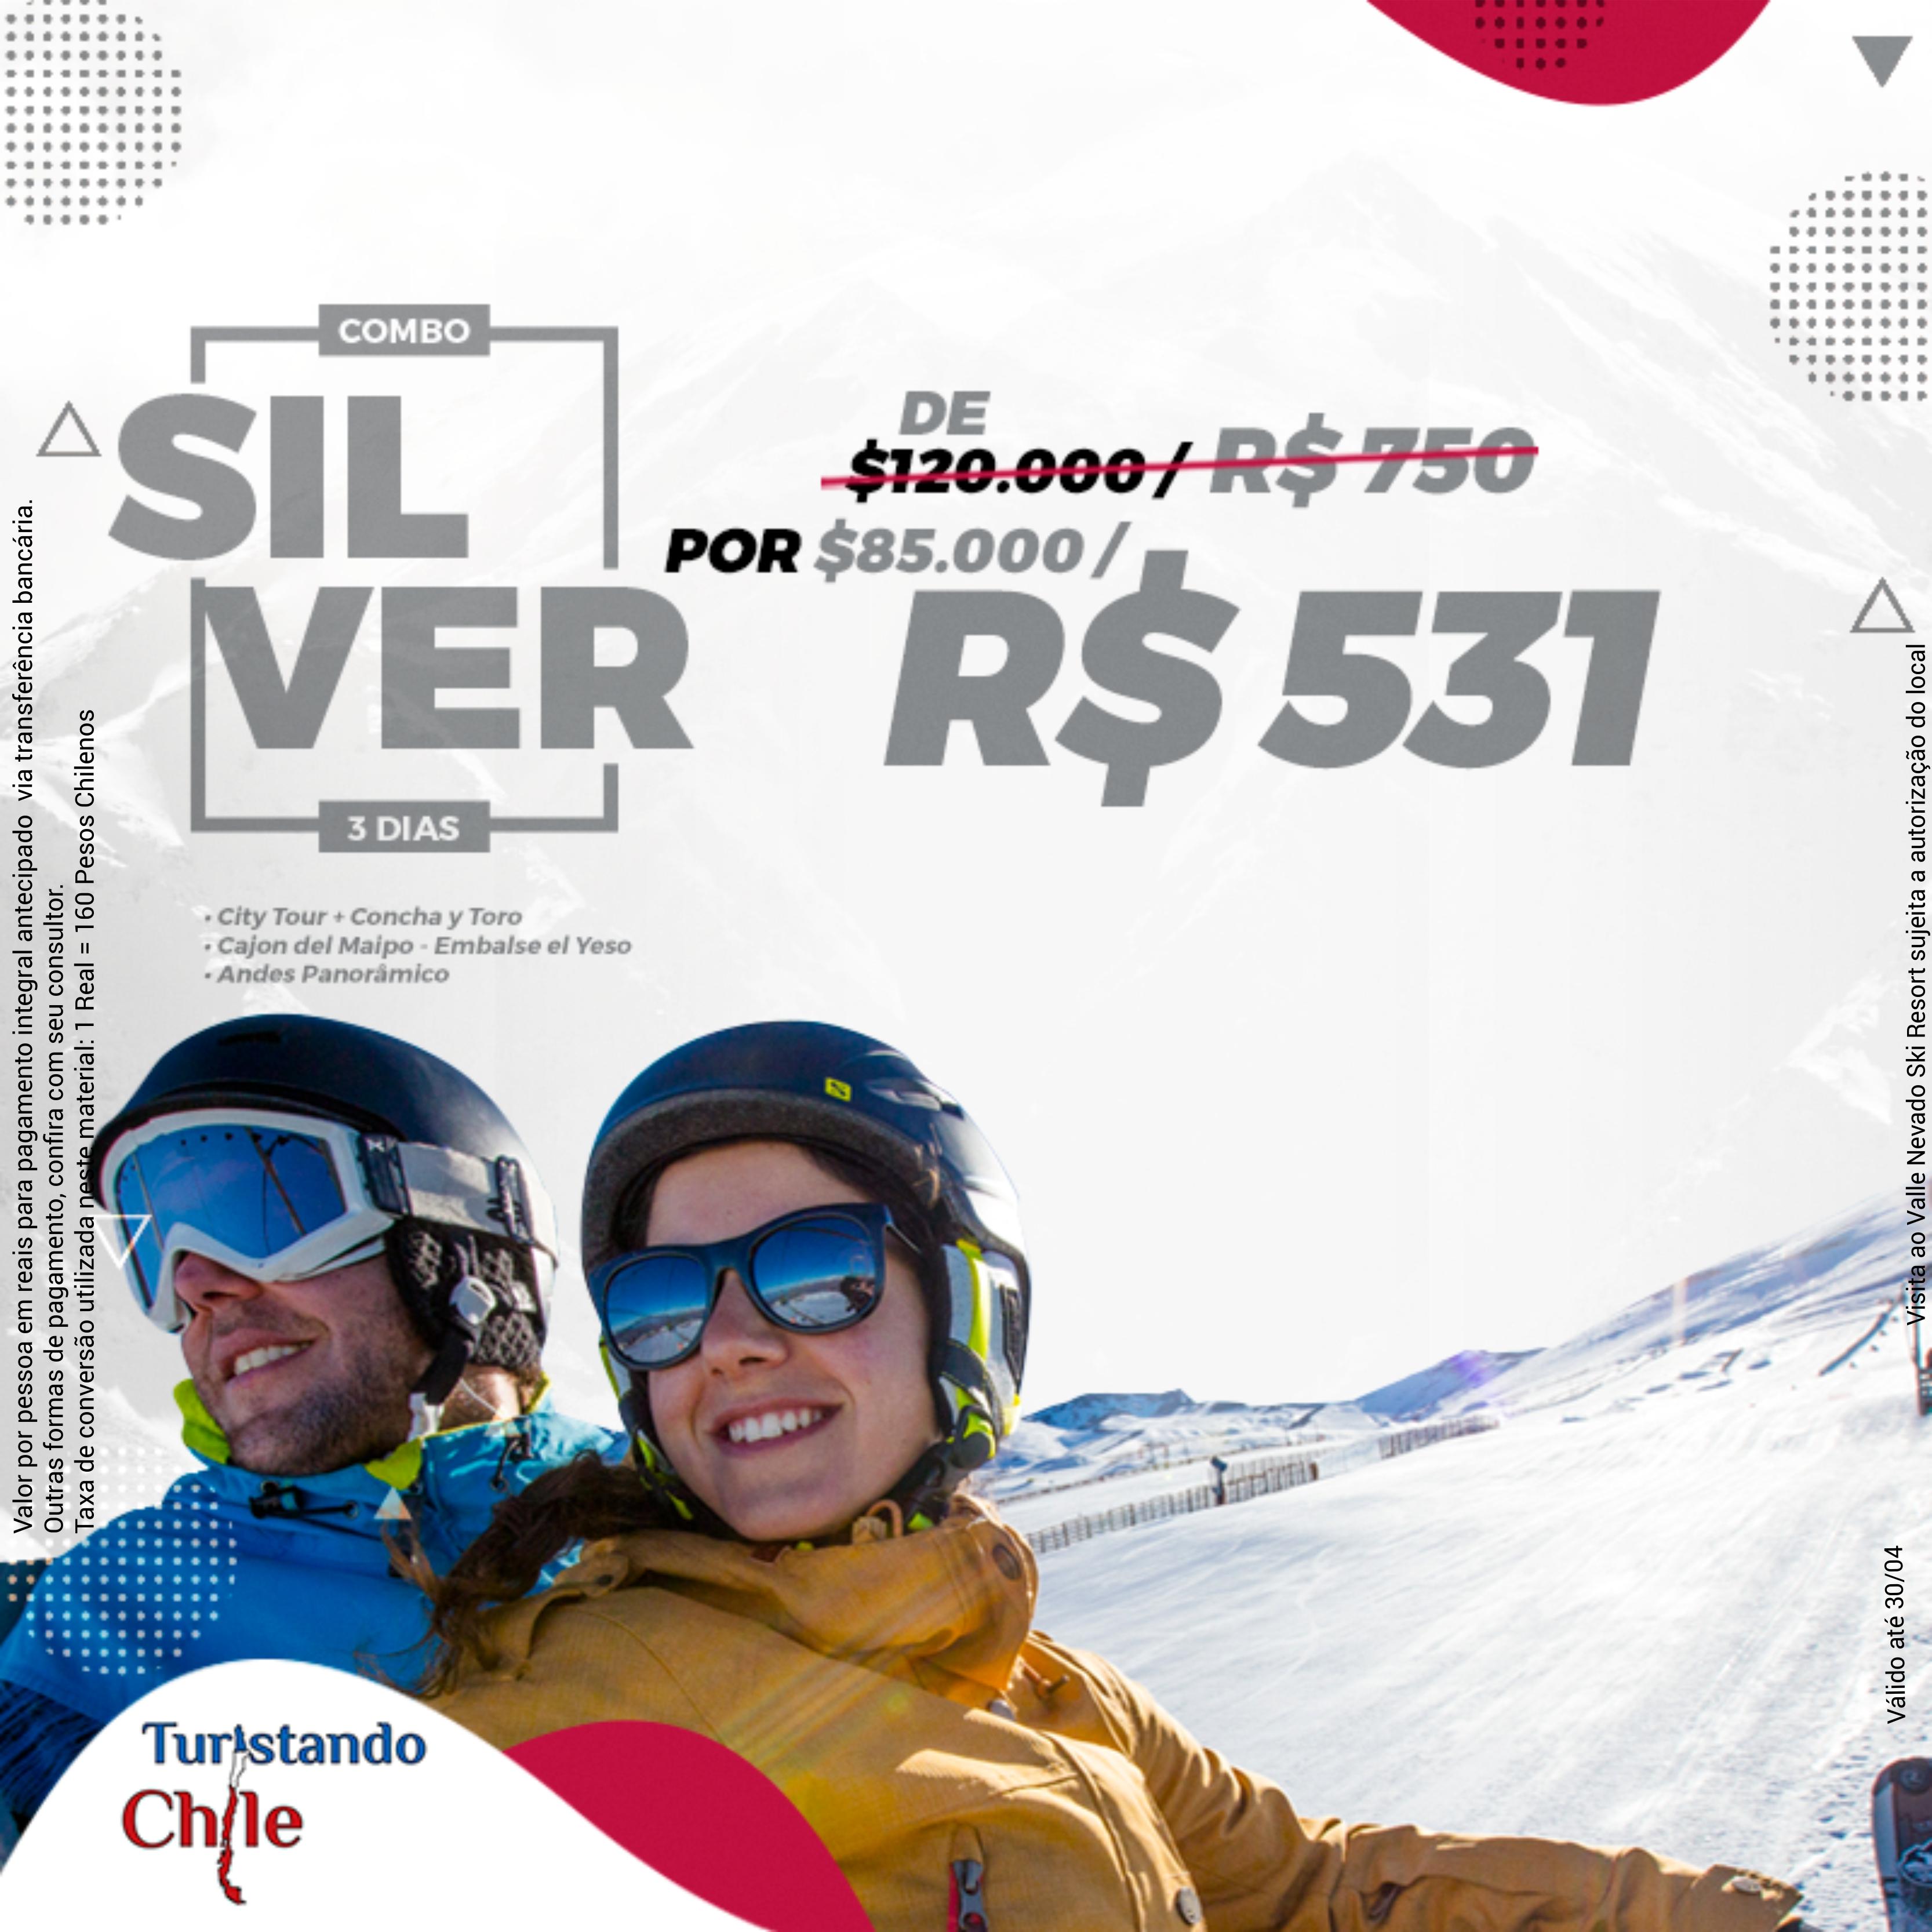 Pacotes Turistando Chile - Combo Silver